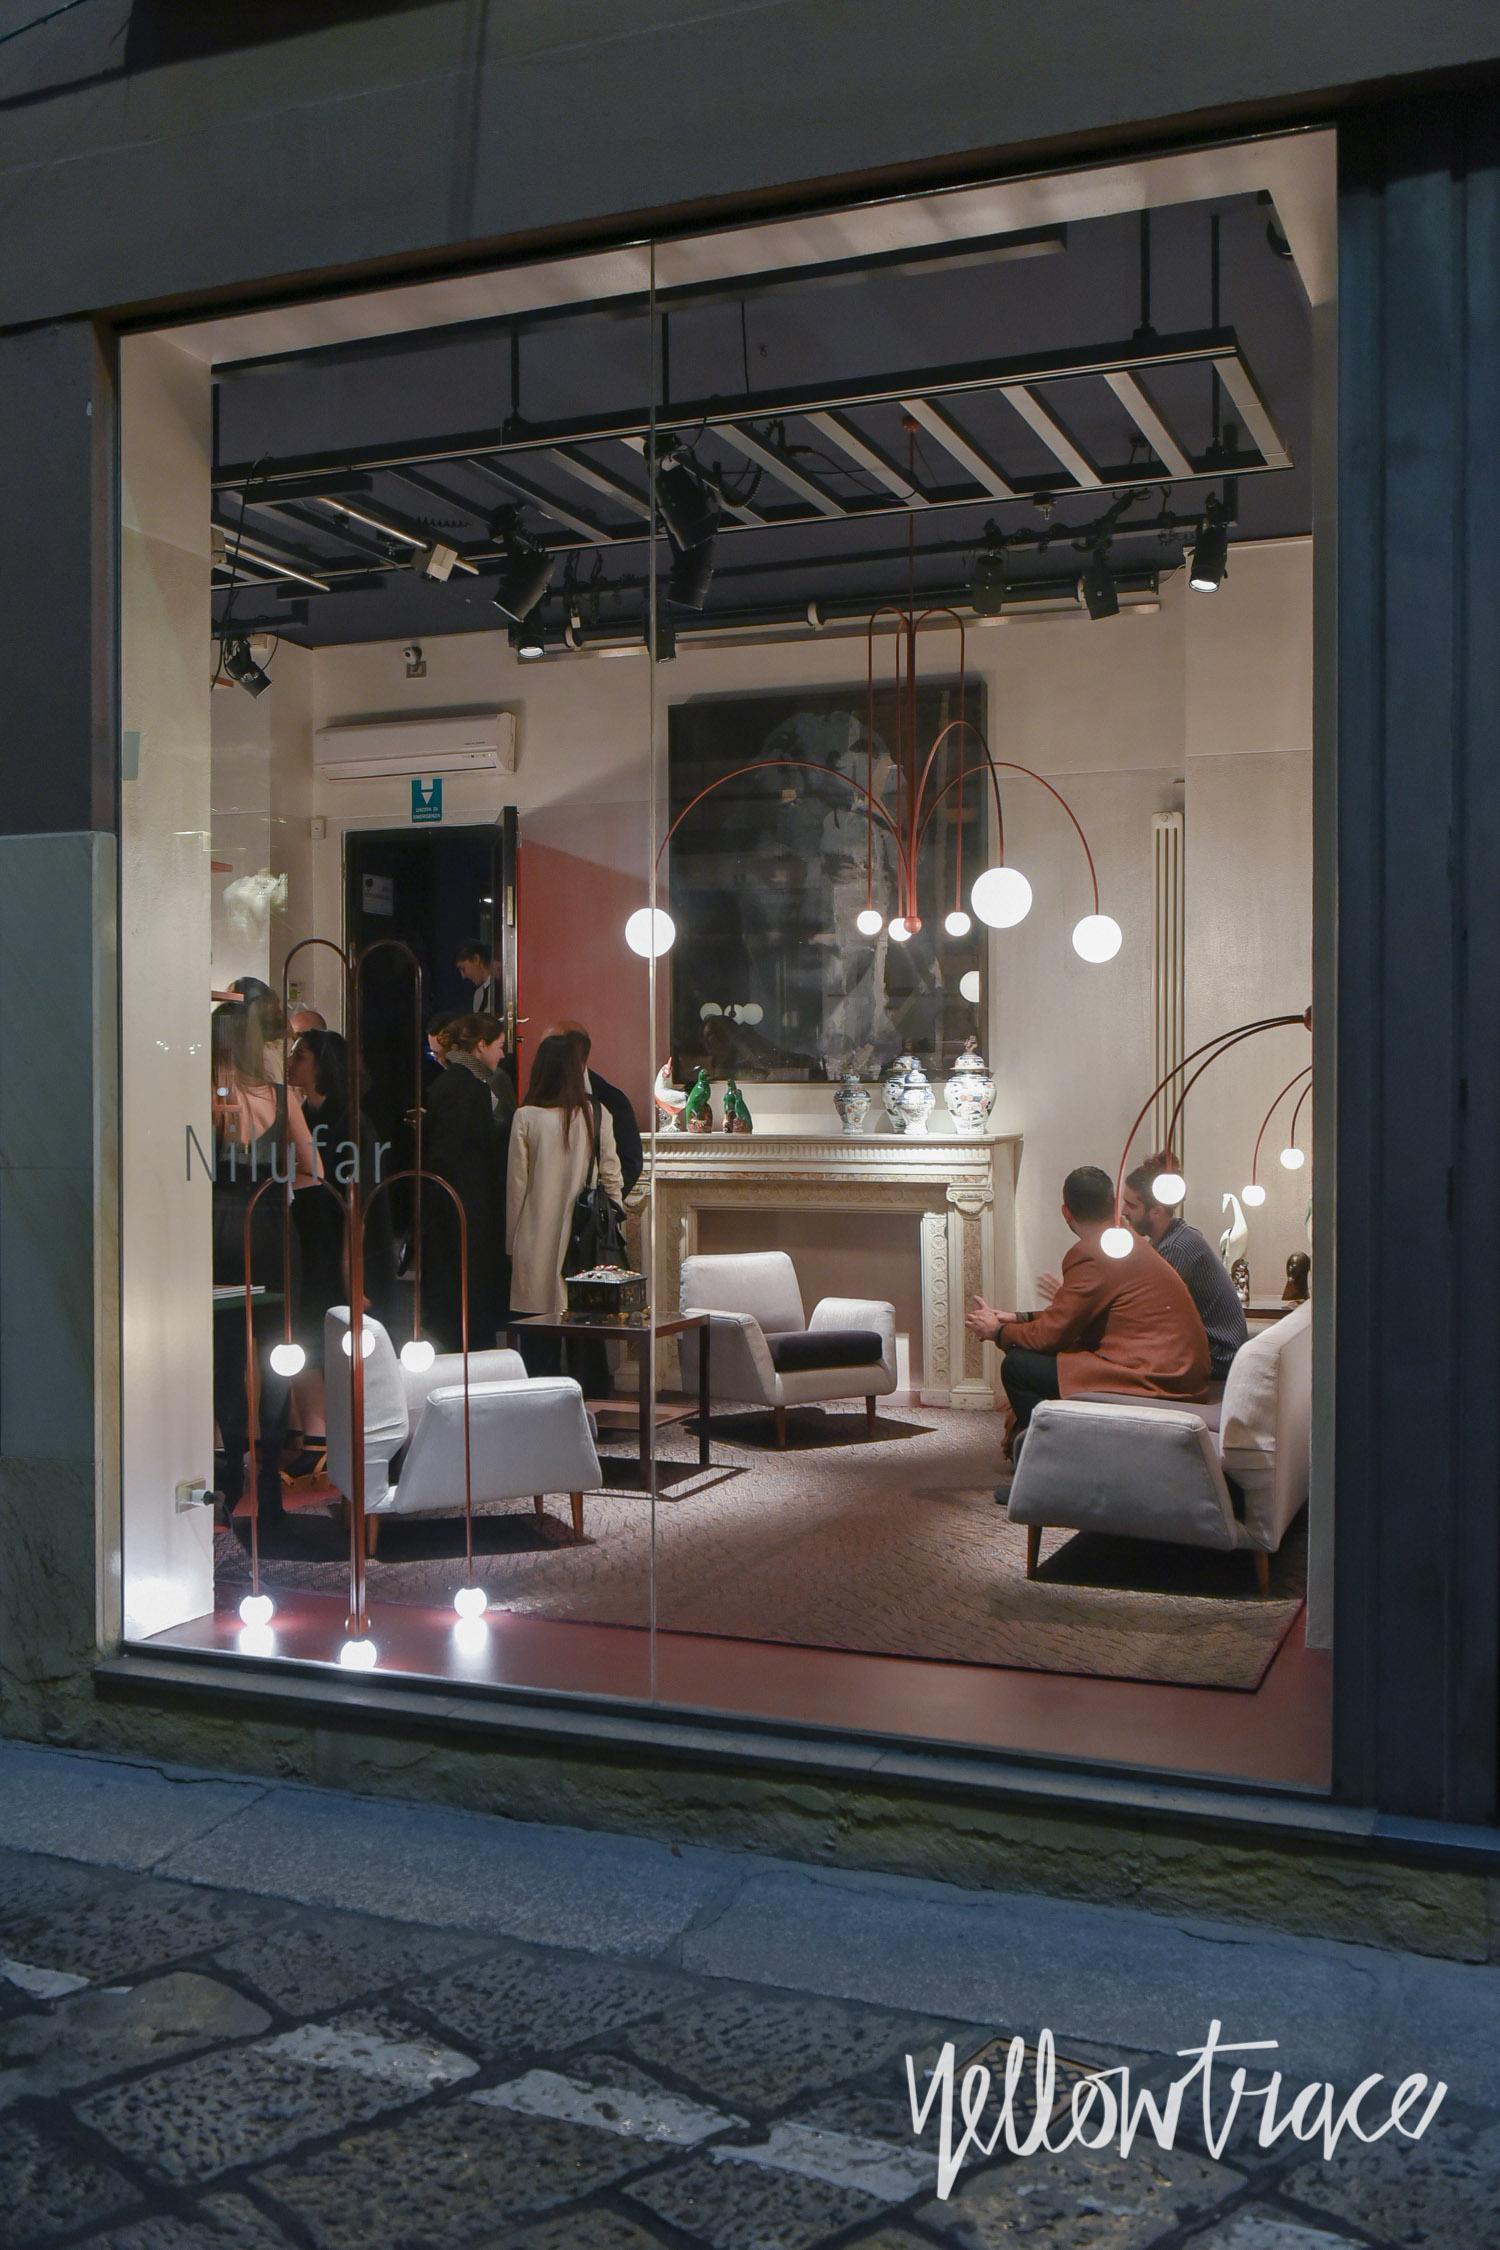 Milan Design Week 2017 Highlights, Nilufar Gallery on Via Della Spiga, Photo © Nick Hughes | #Milantrace2017